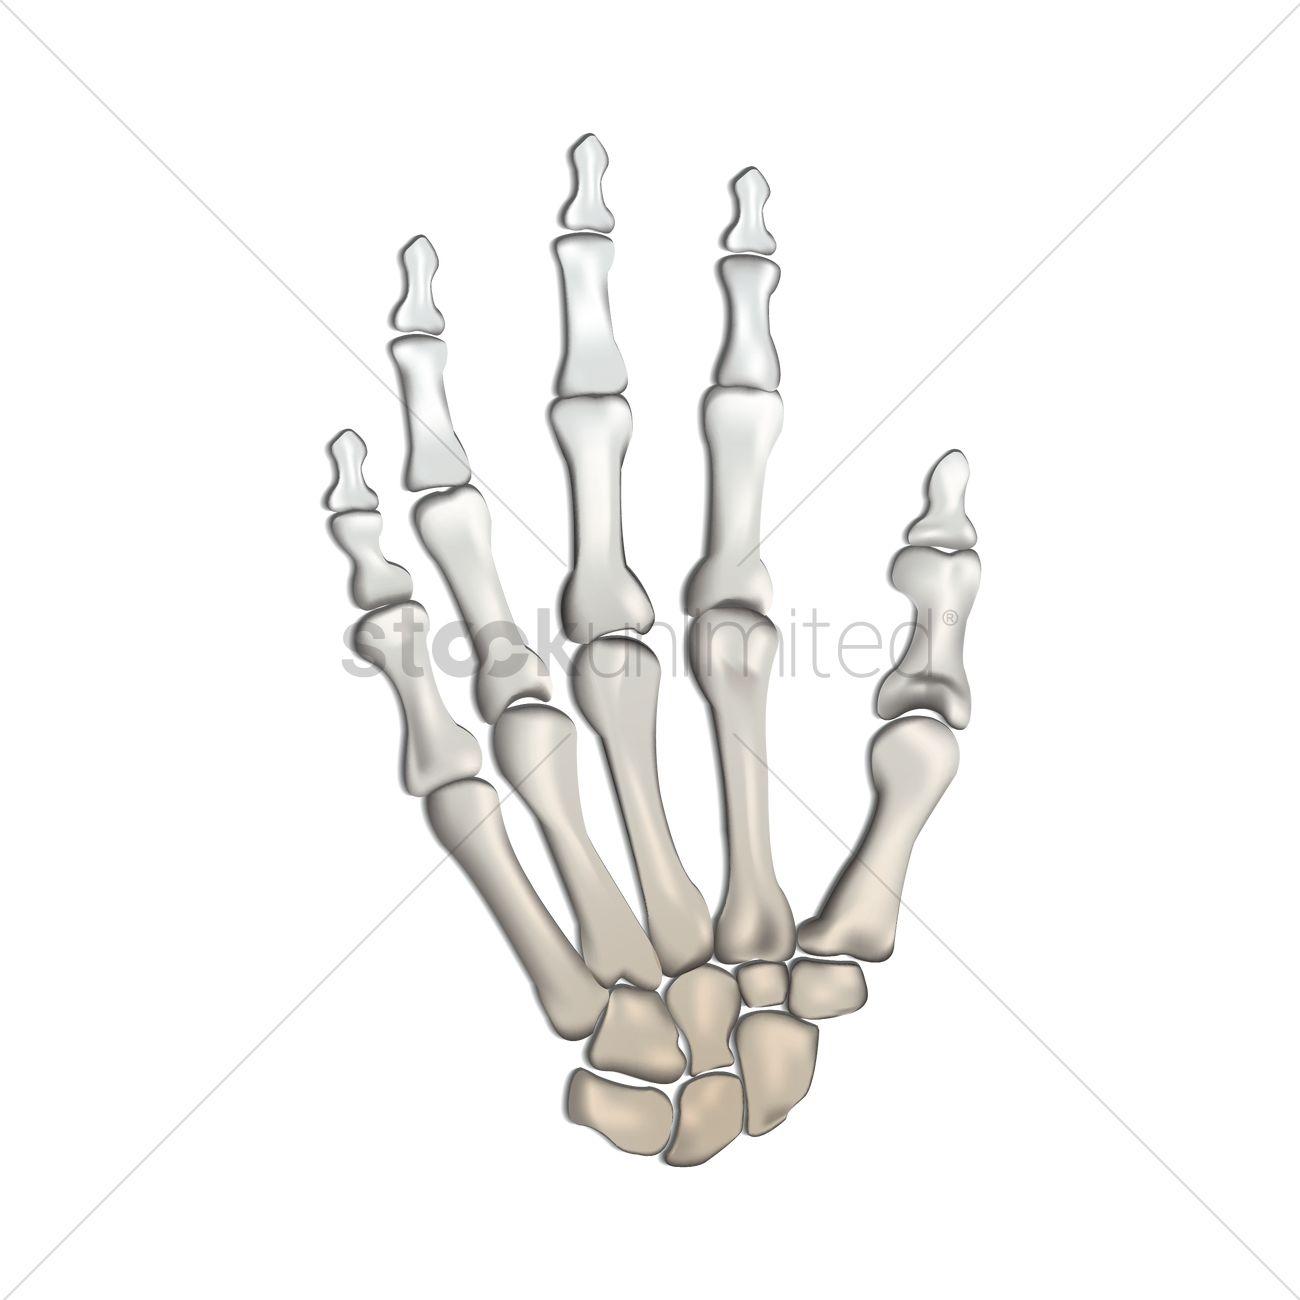 Bones Of Human Hand Vector Image 1815224 Stockunlimited